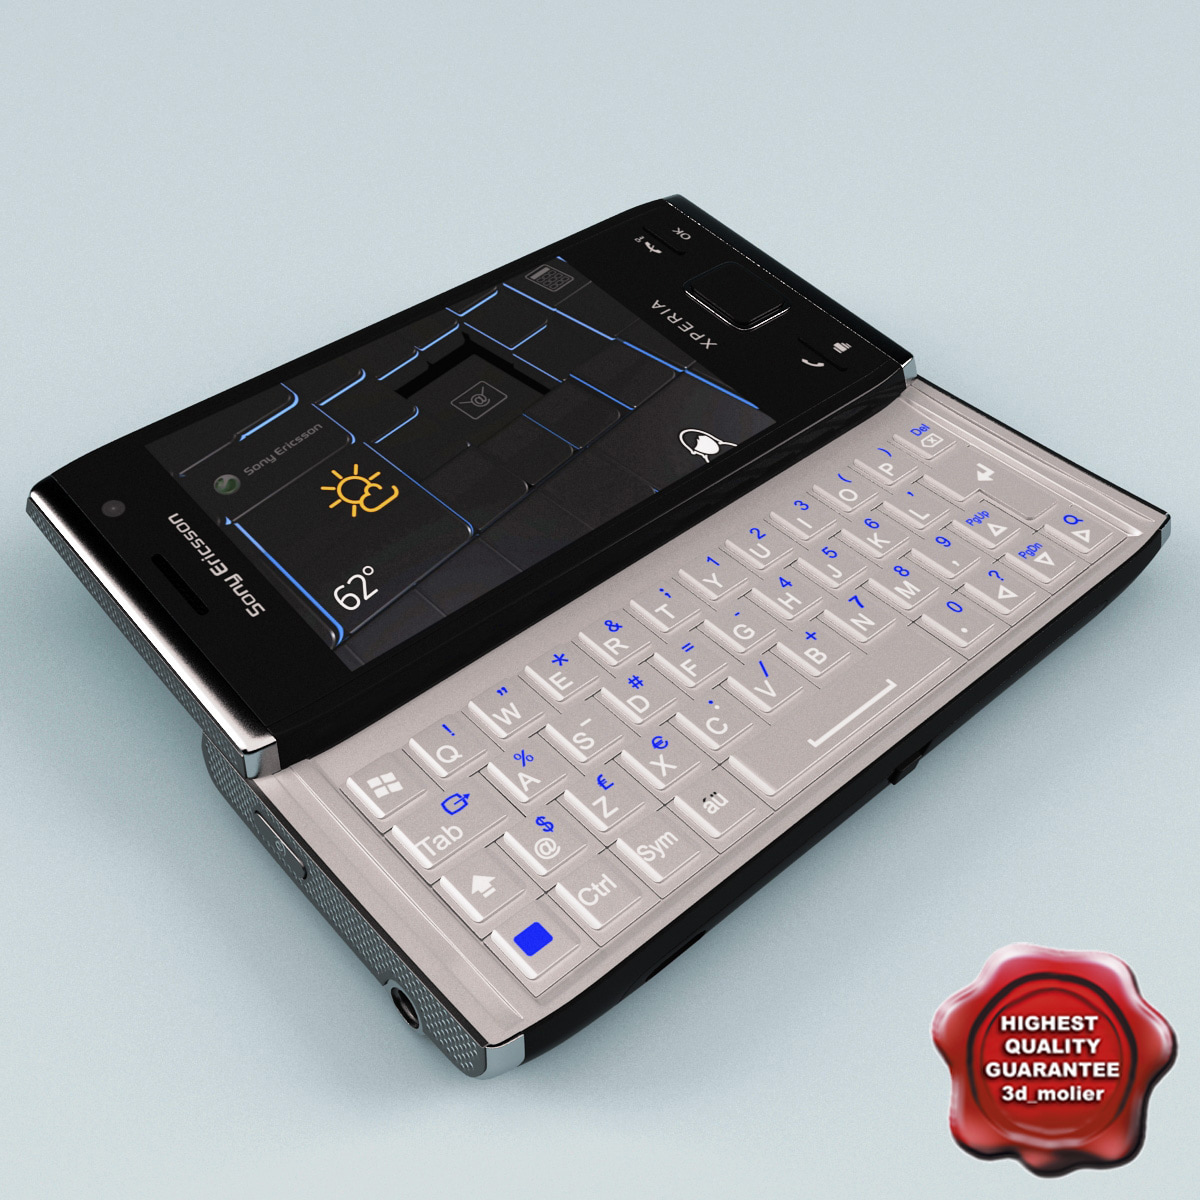 Sony_Ericsson_Xperia_X2a_00.jpg